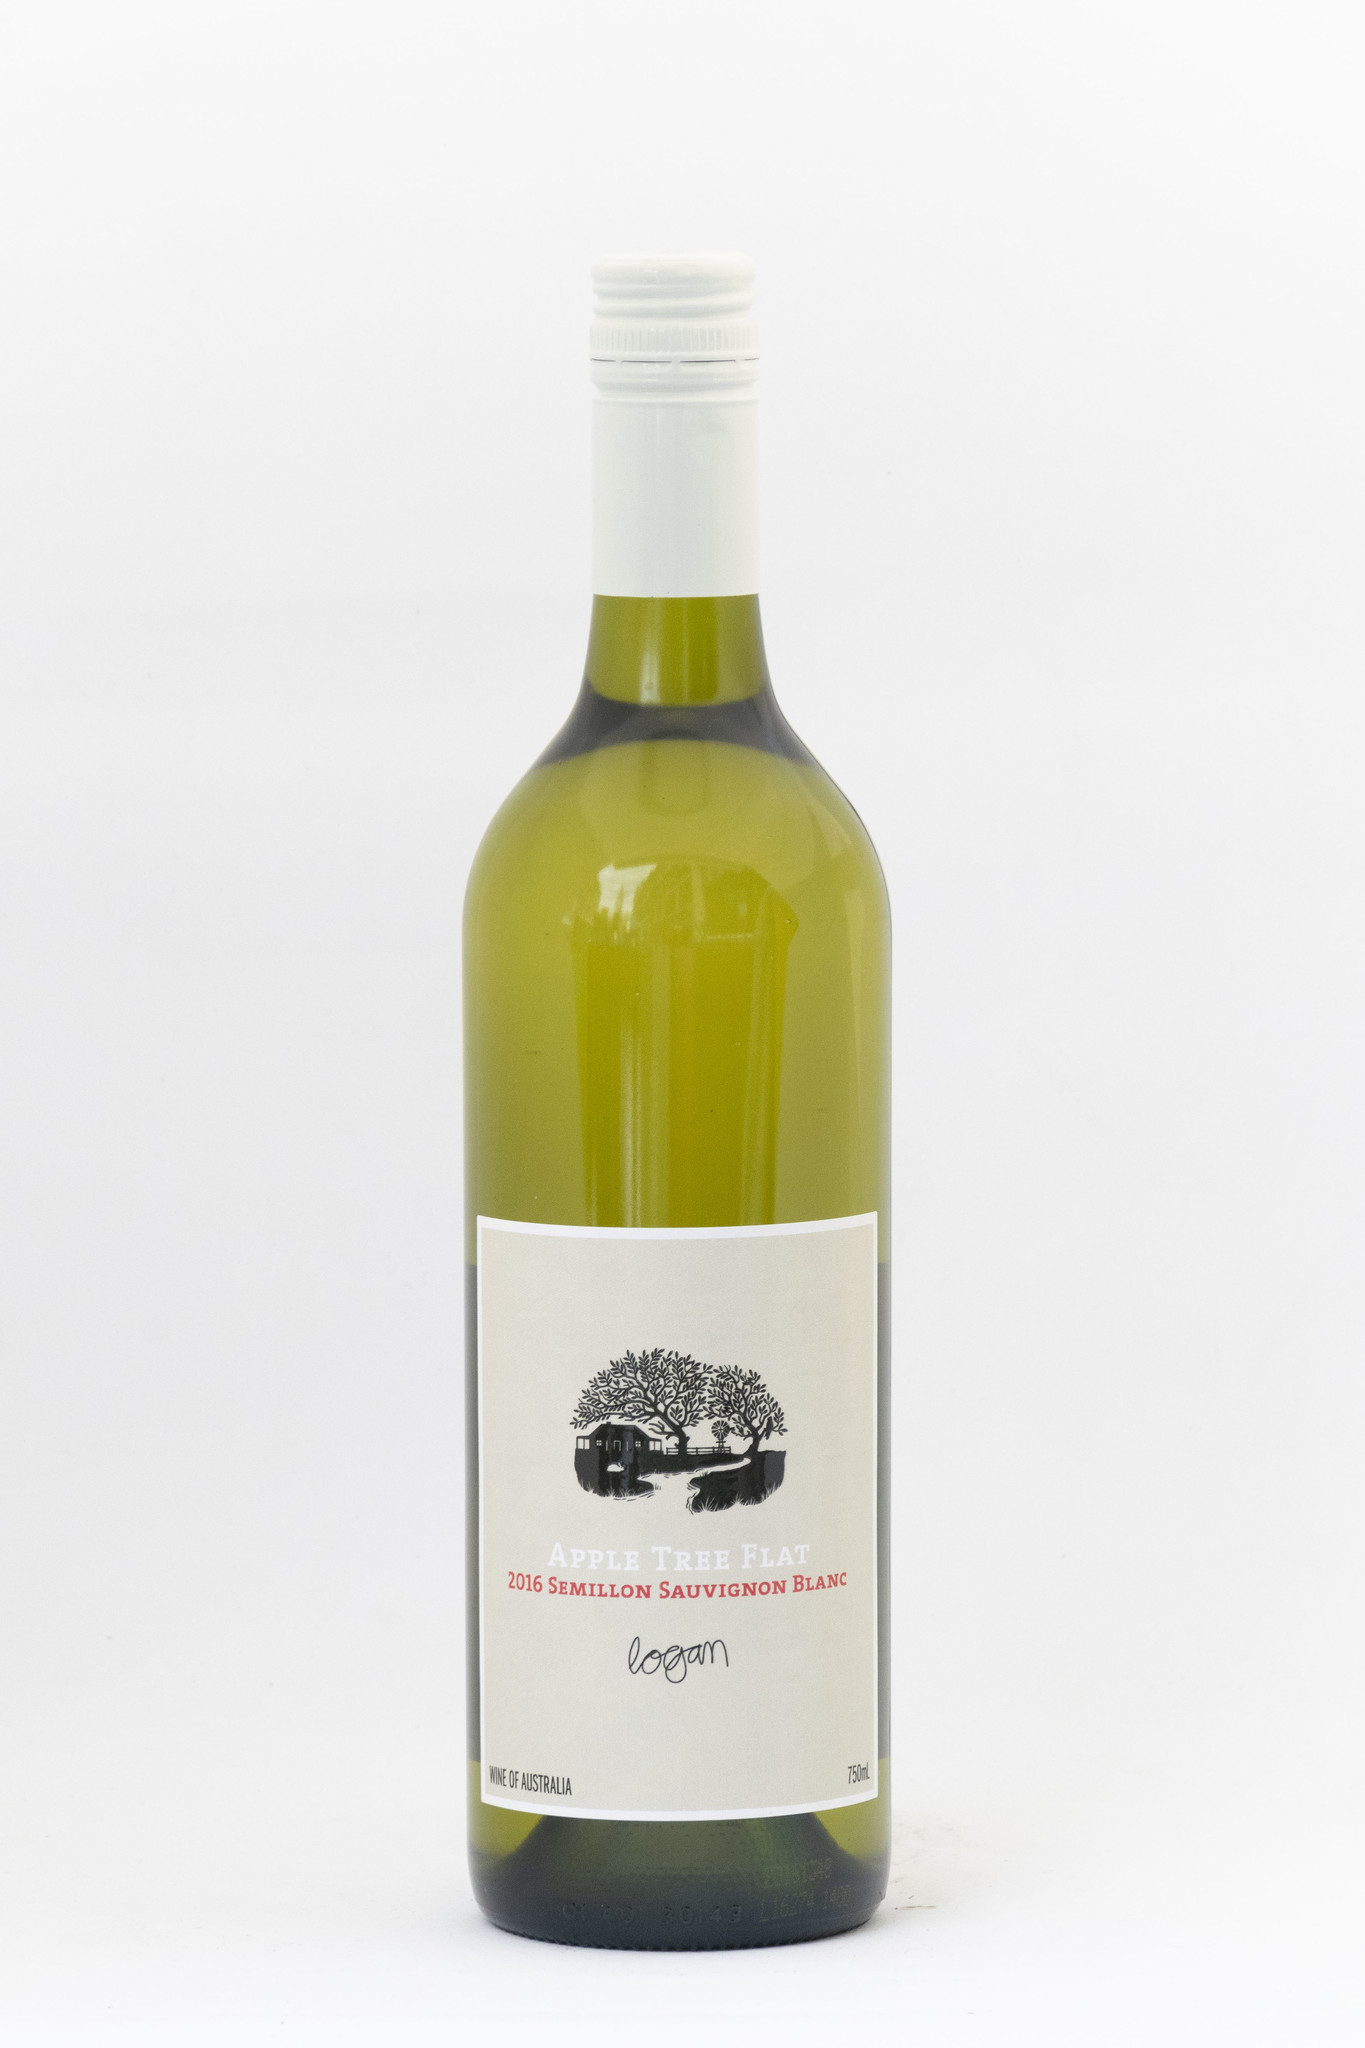 Apple Tree Flat | Semillion -Sauvignon blanc | Peter Logan wines | 2016